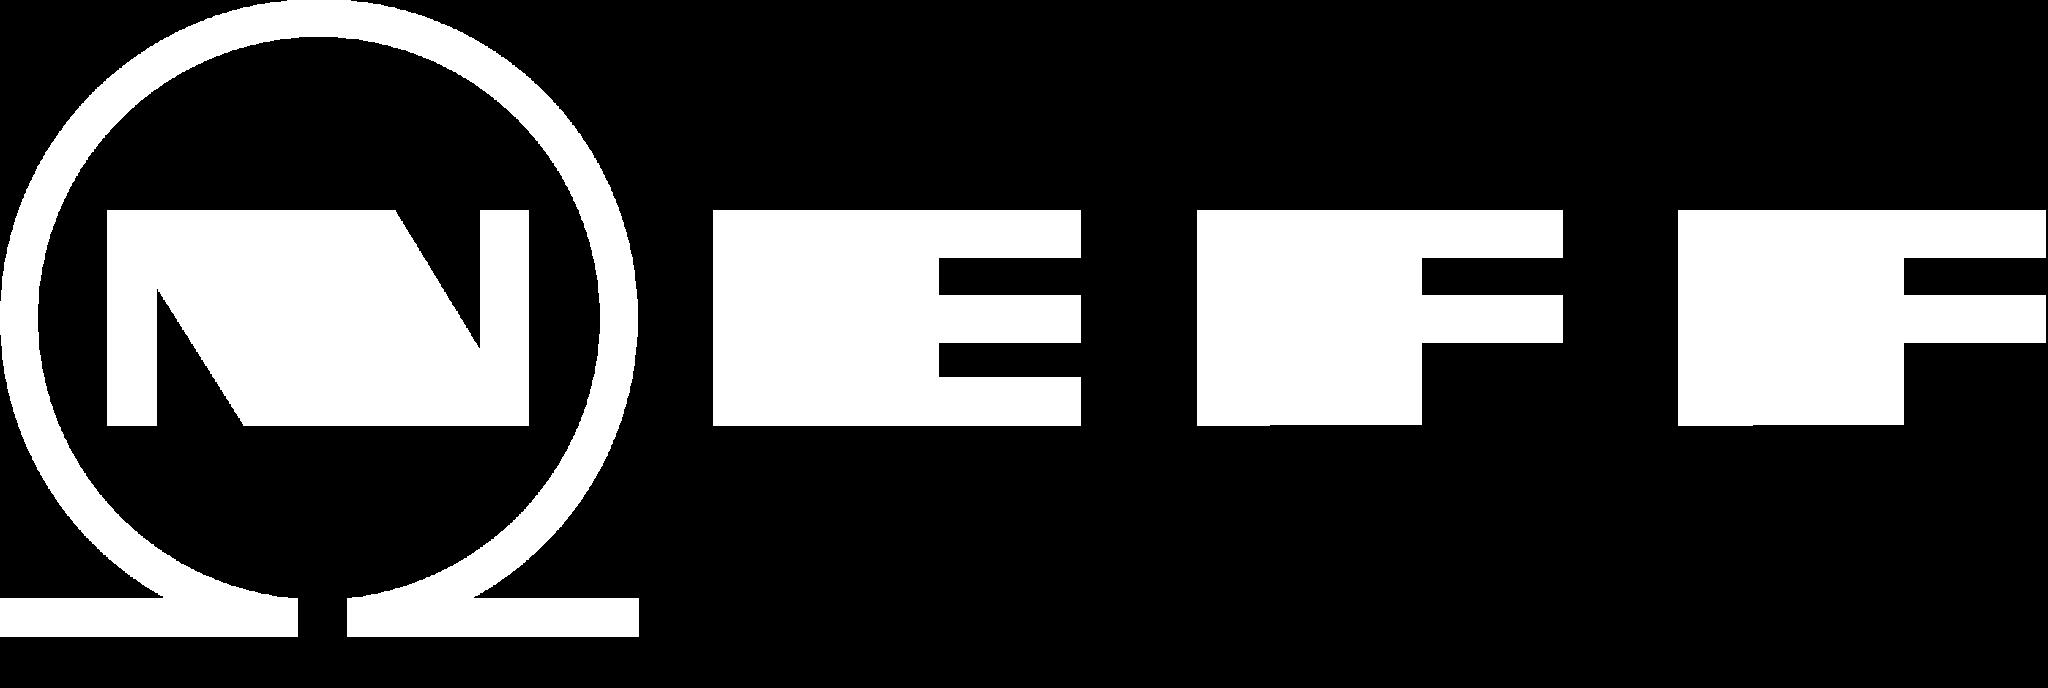 neff-logo-without-straplinergb